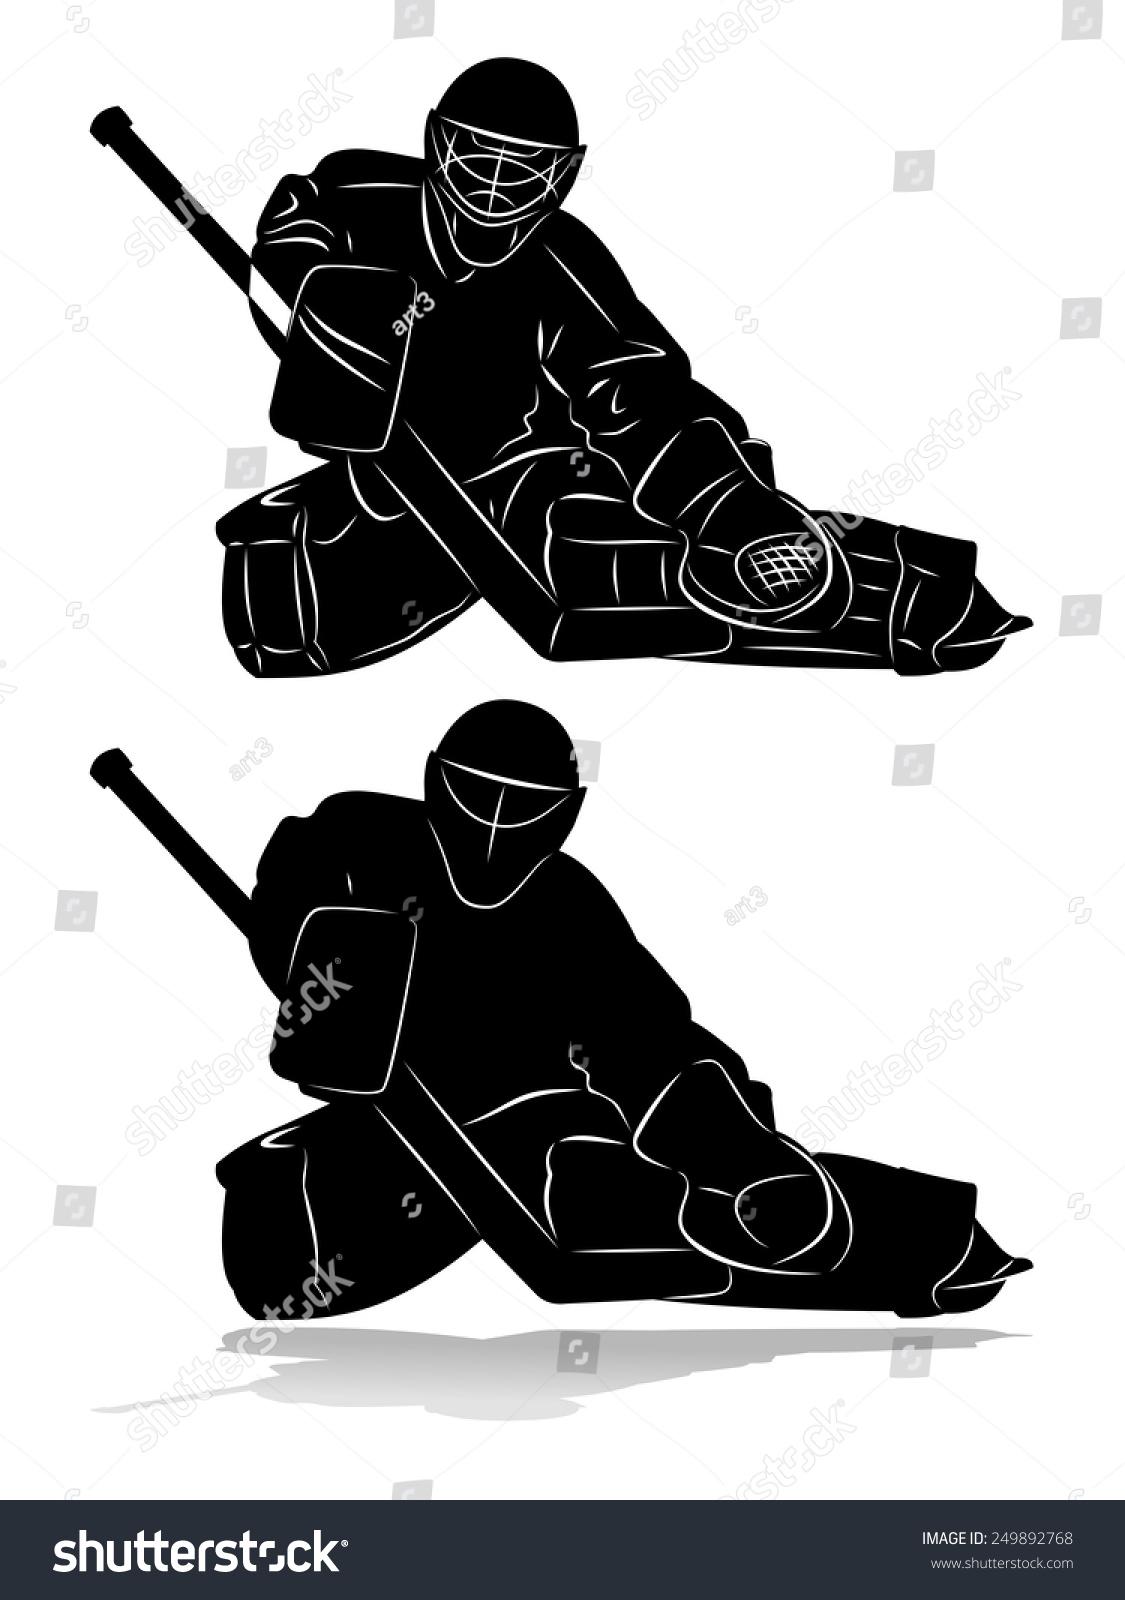 Vector Of Ice Hockey Goalie Silhouette Stock Photo 249892768